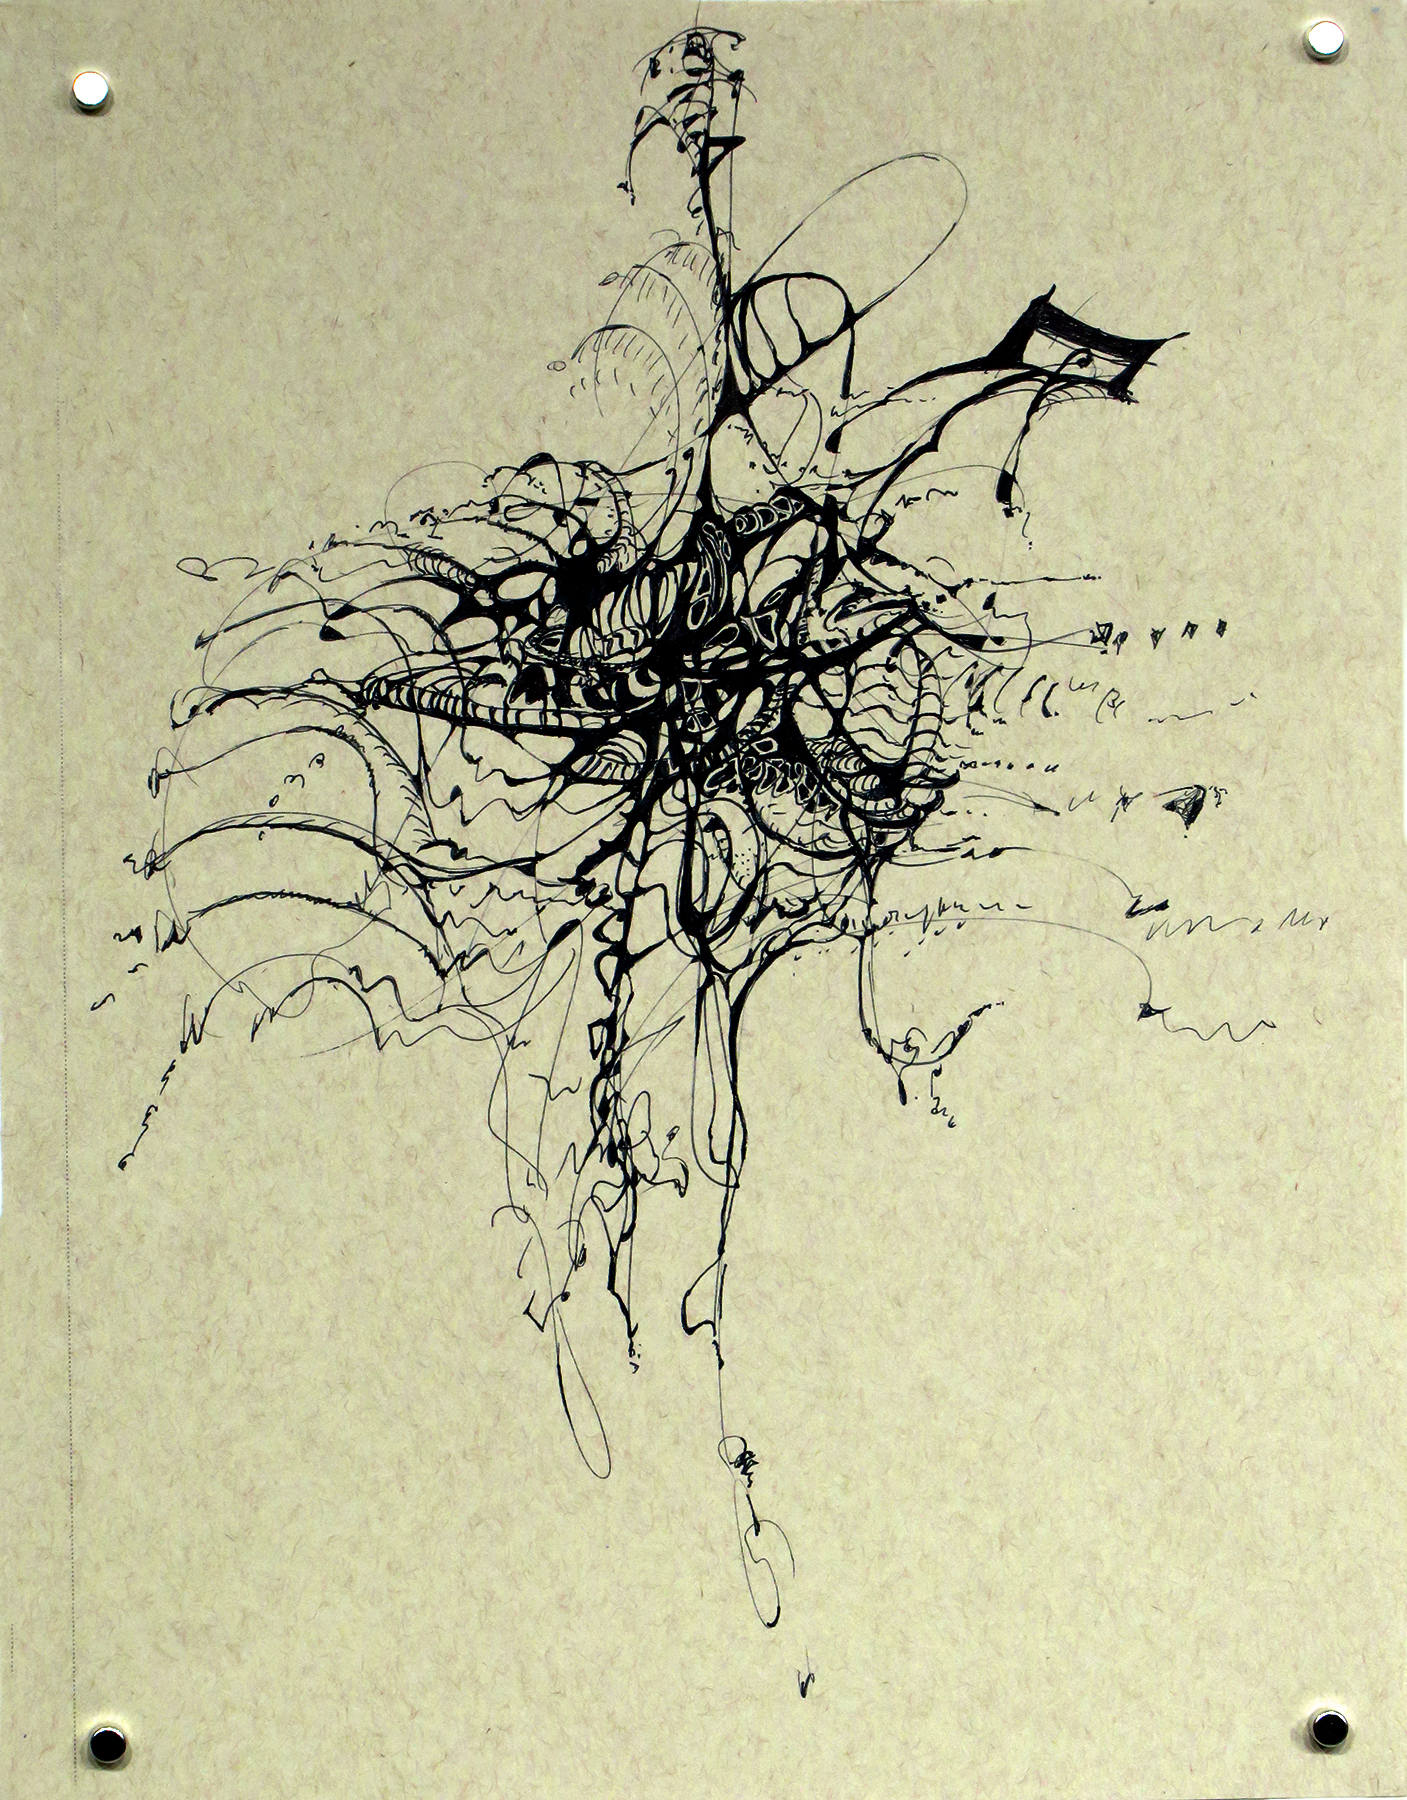 Kathryn Hart, Daunting Transitions, Krakow, Ink Drawing 3